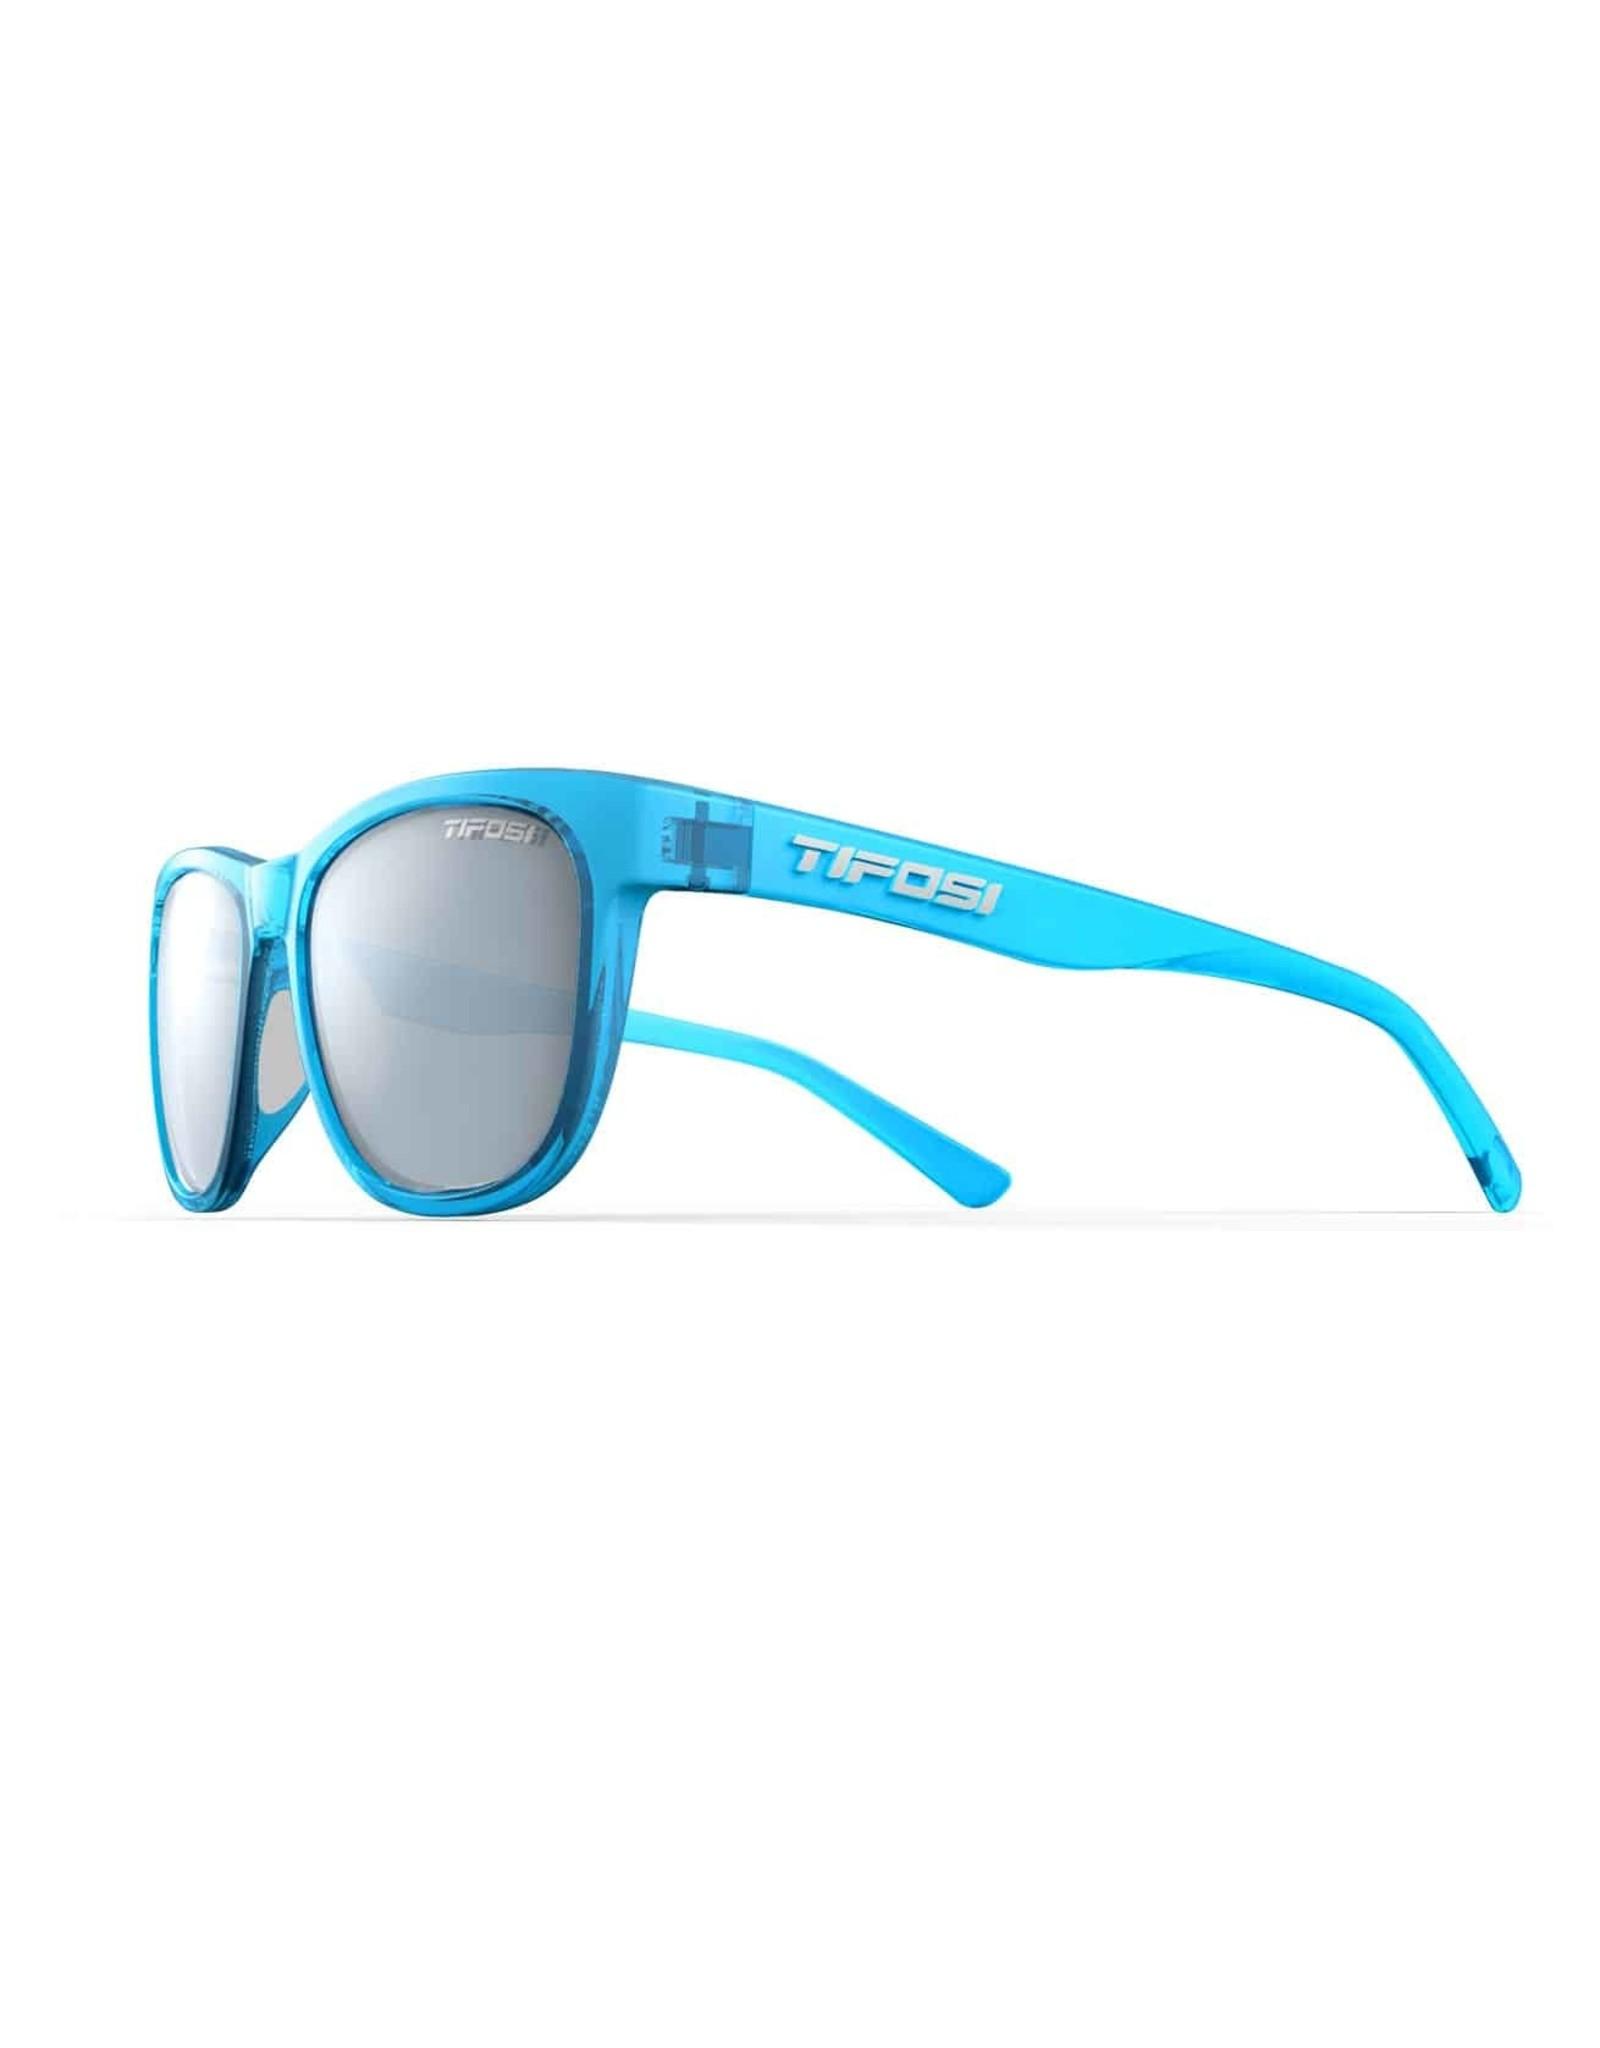 Tifosi TIFOSI Swank Sunglasses